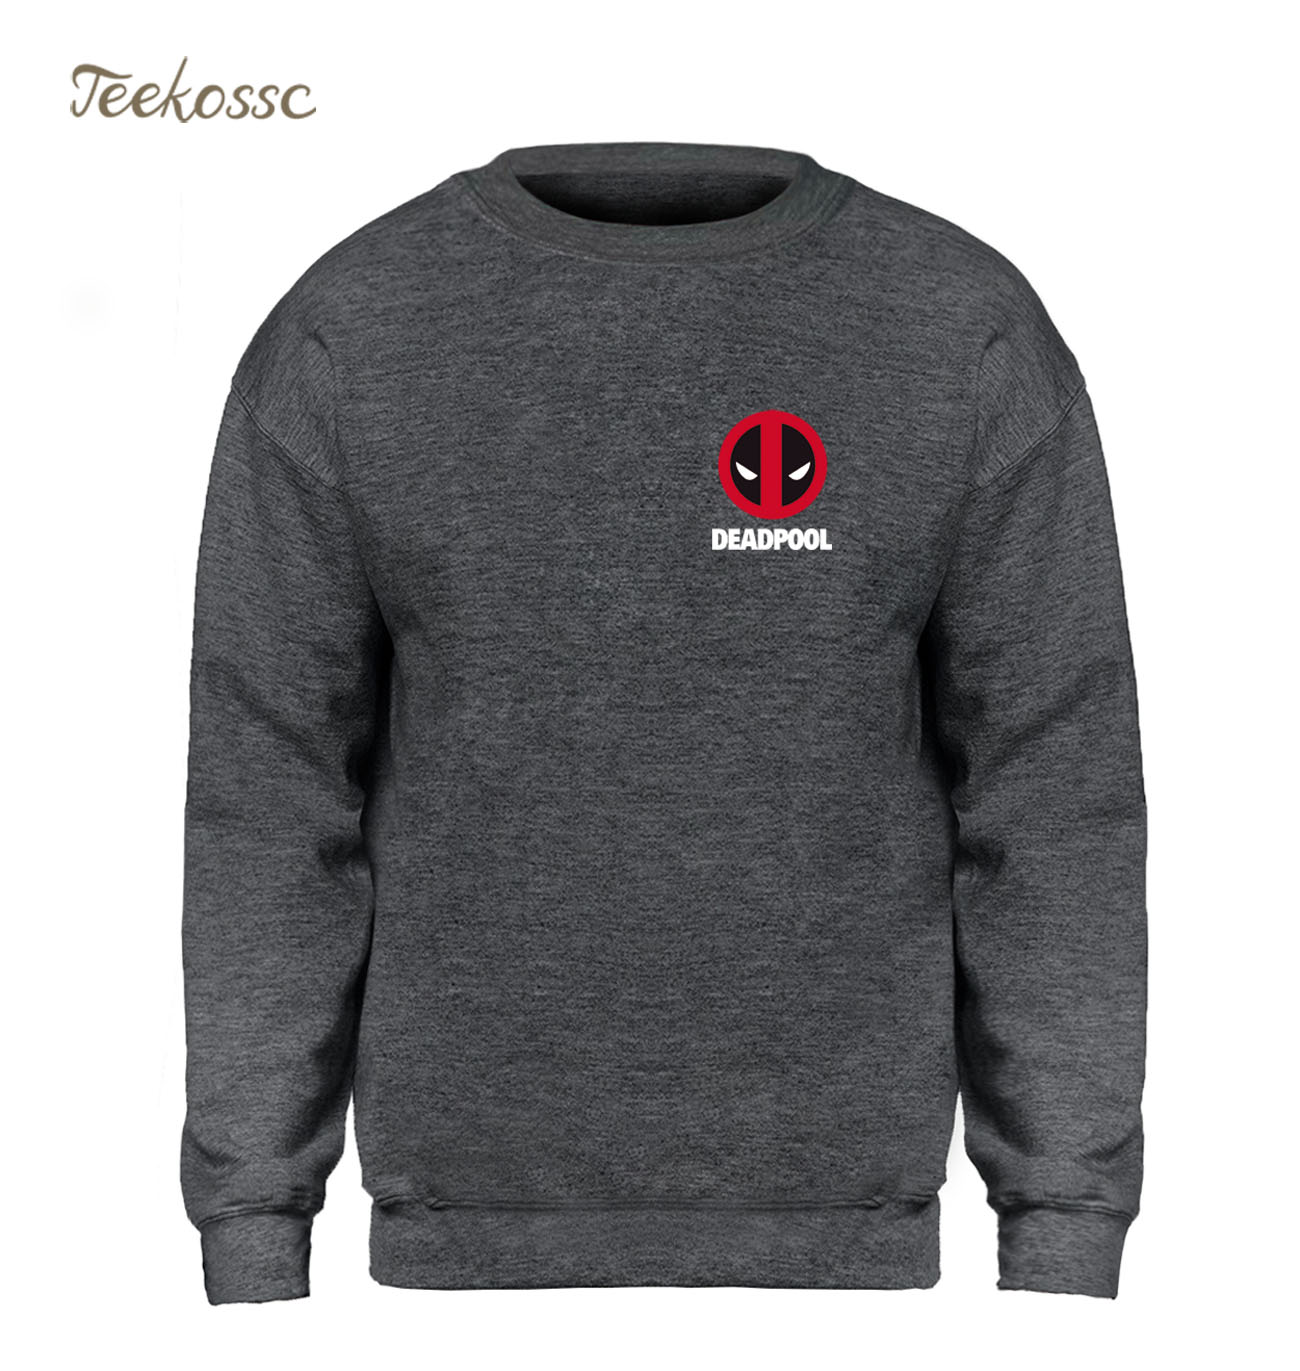 Deadpool X-men Hoodie Sweatshirt Men Super Hero Deal Pool Sweatshirts Mens 2018 Winter Autumn Fleece Warm Grey Cool Streetwear